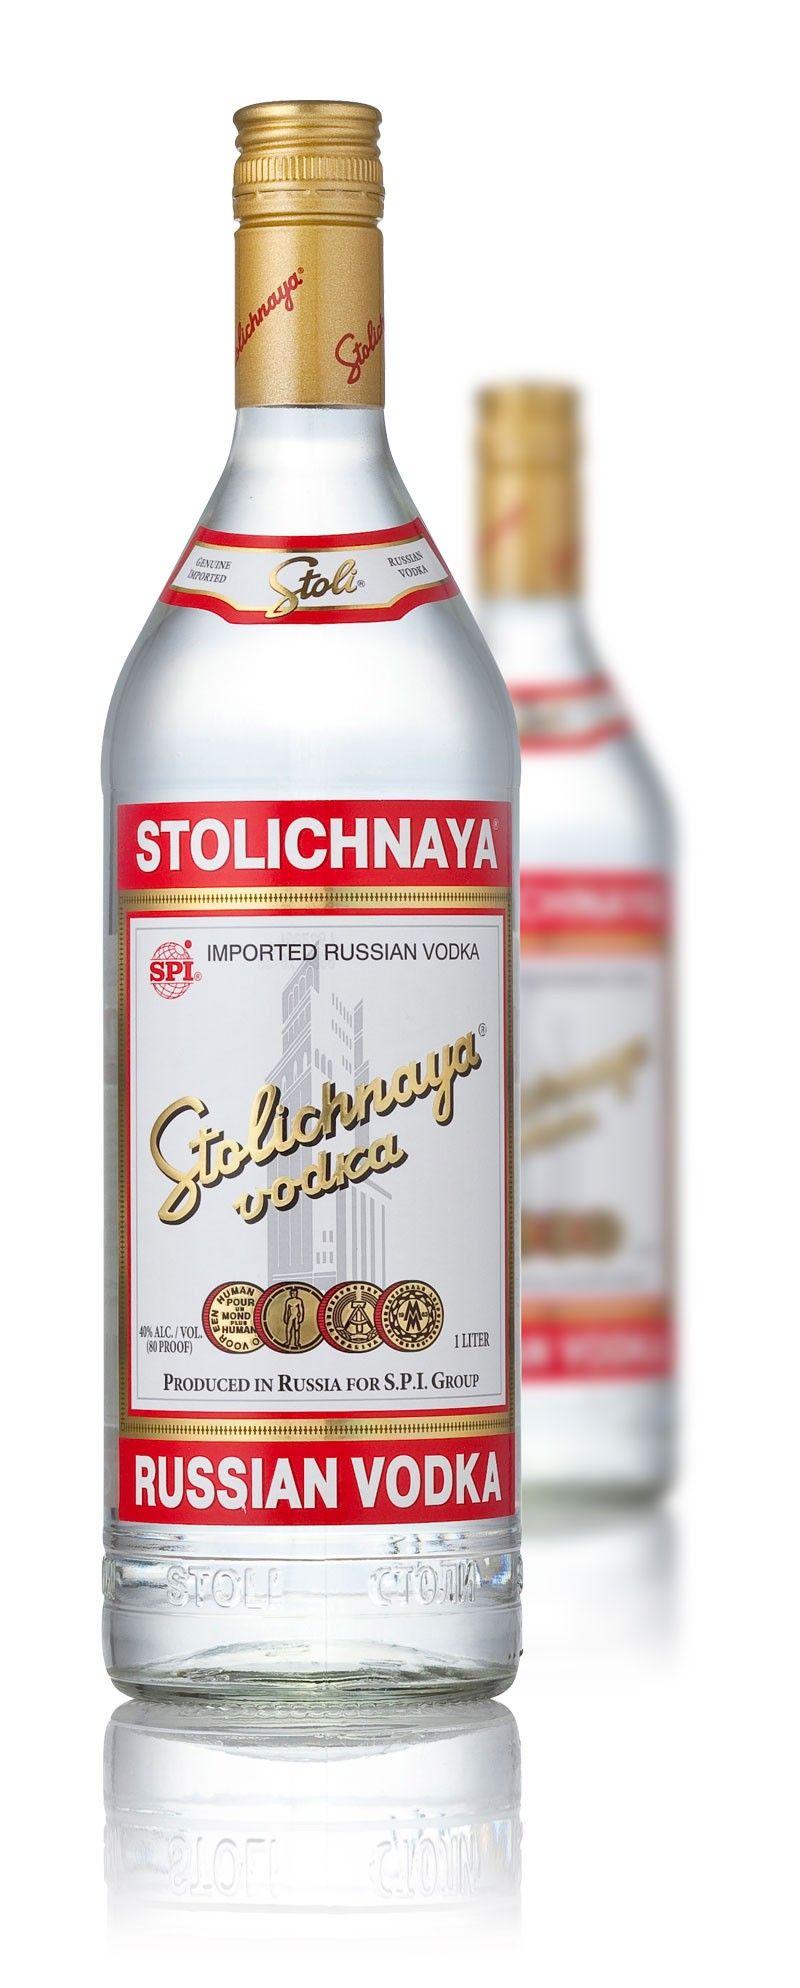 Pin By Miksu Nieminen On Rooki Vodka Tequila Russian Vodka Vodka